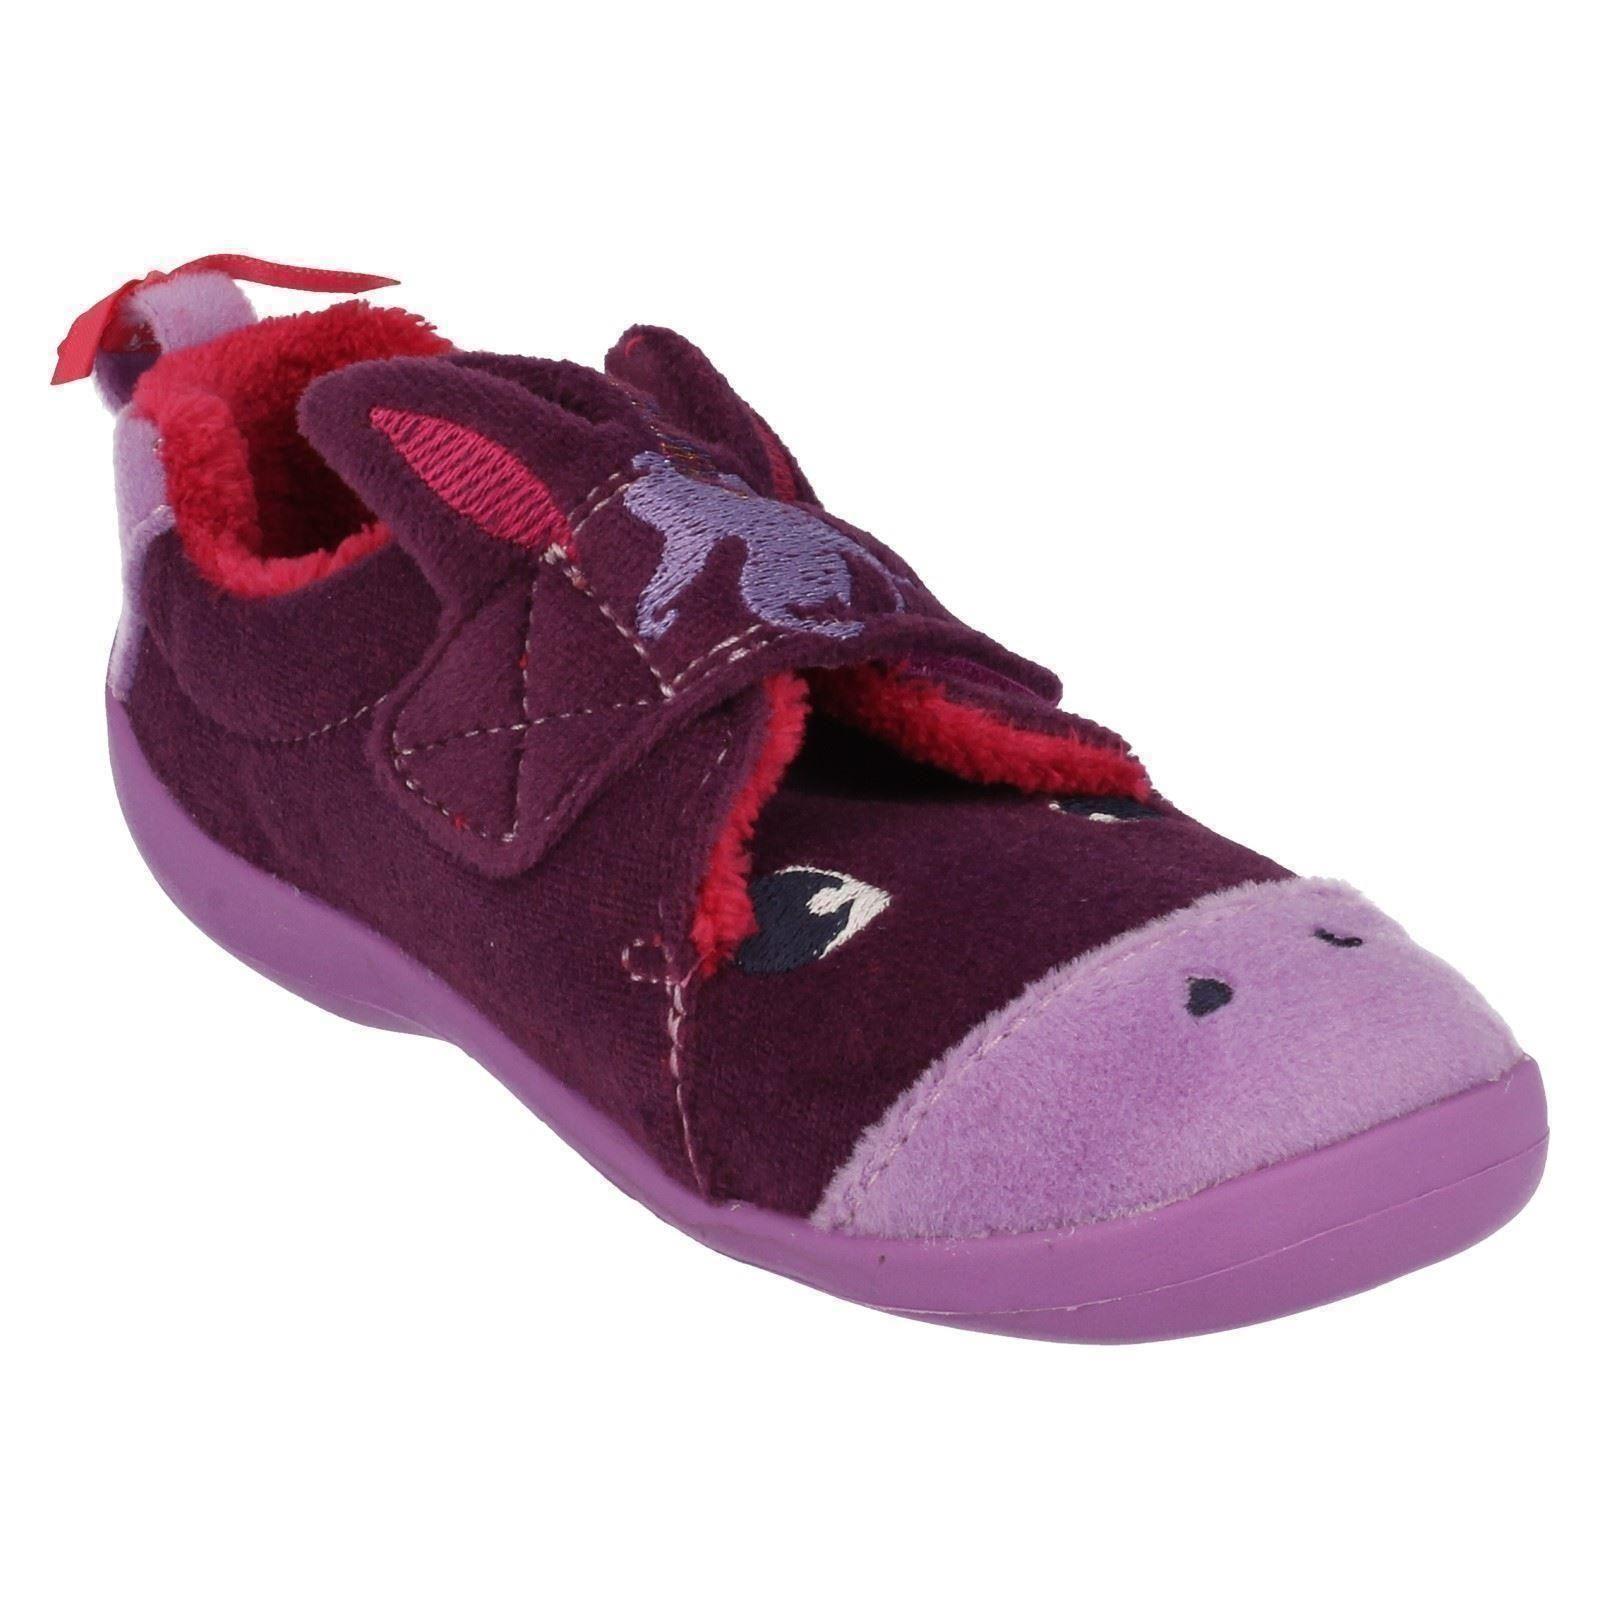 Infant Clarks Girls Slippers Magical Sleep